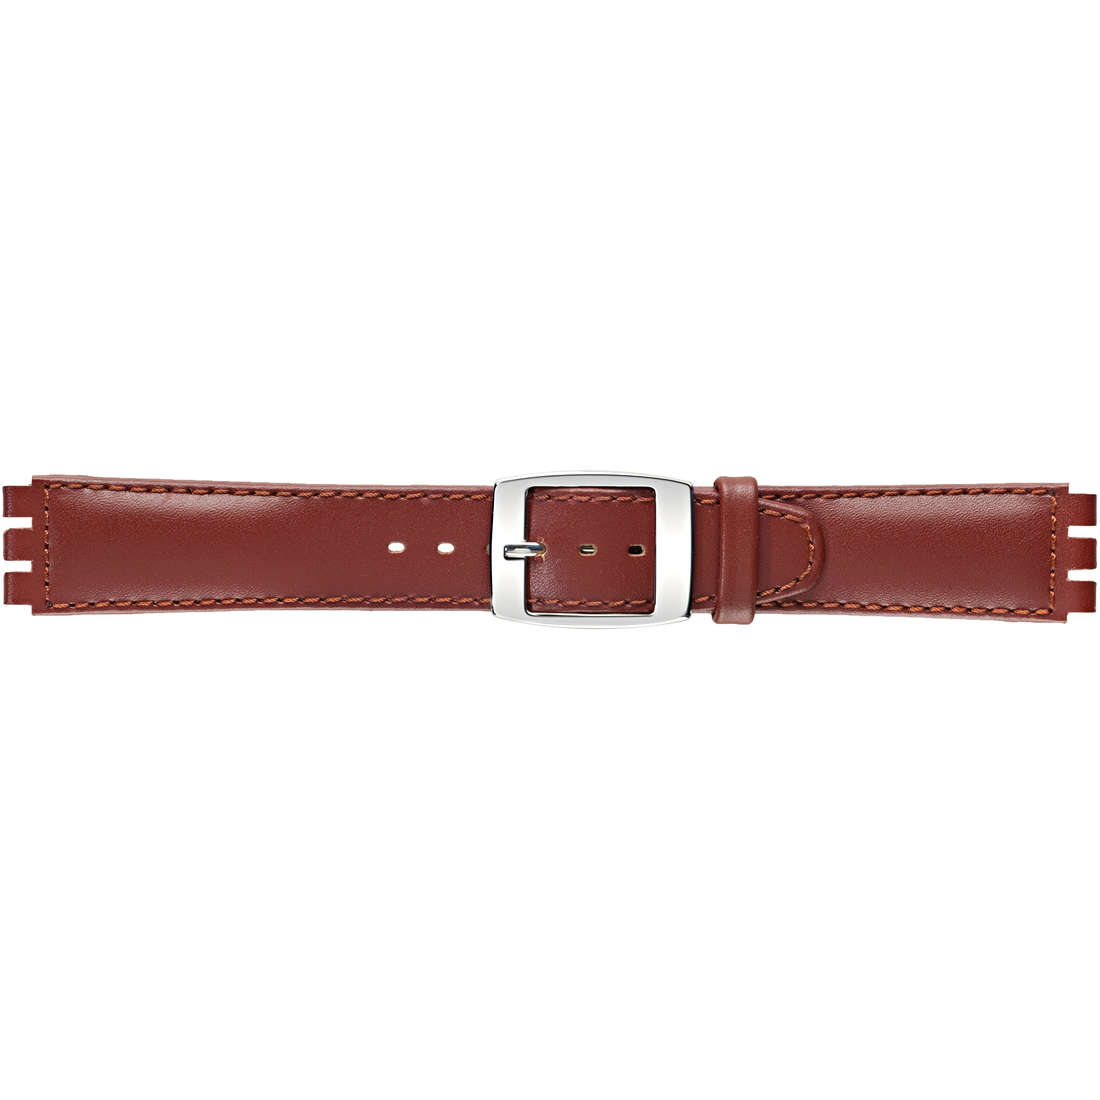 watch watch bands watch straps man Morellato Swatch A01U2740640757MO17